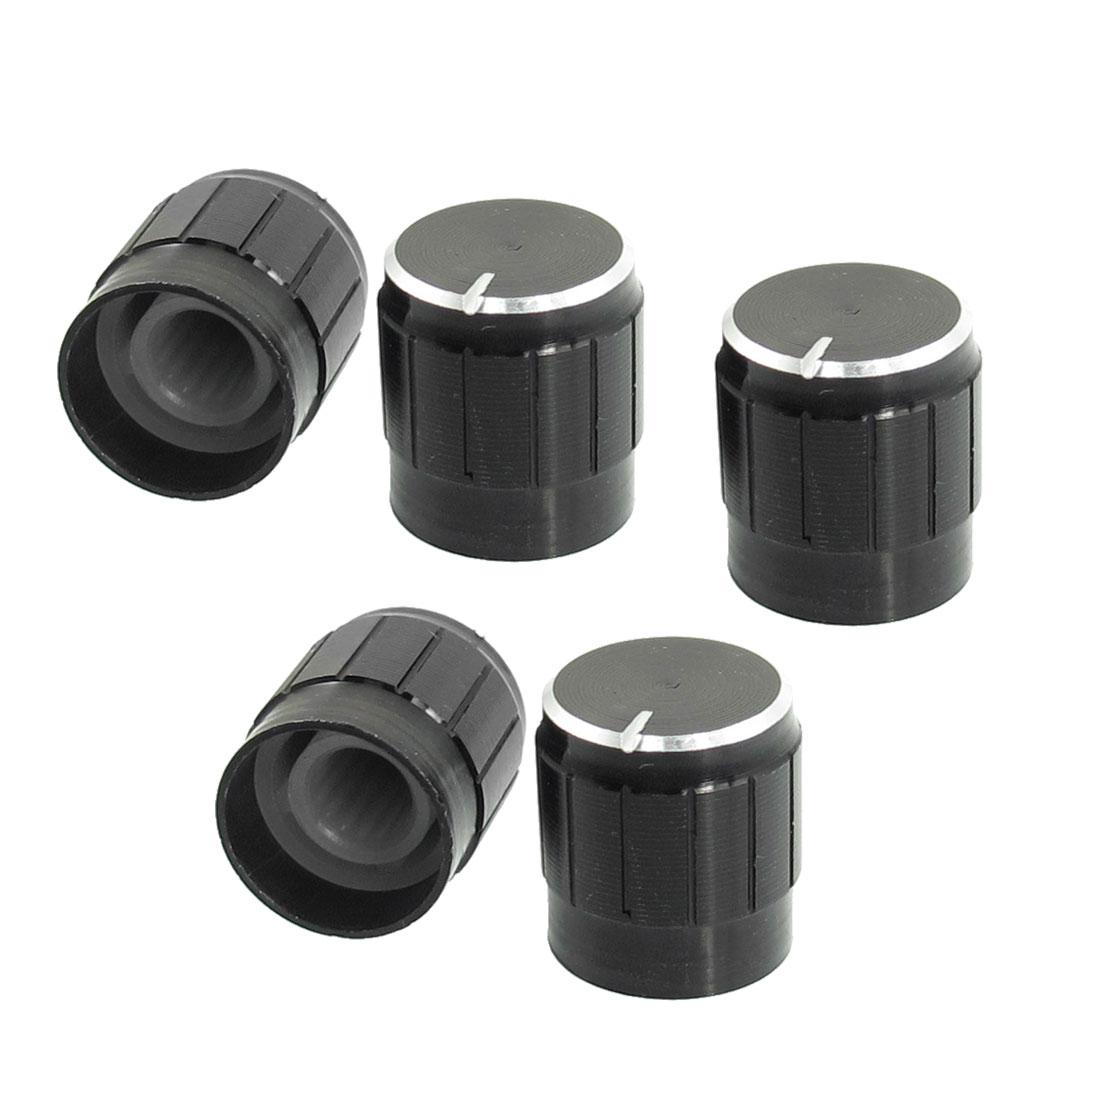 5 Pcs Black Metal 6mm Knurled Shaft Insert Dia. Potentiometer Control Knobs